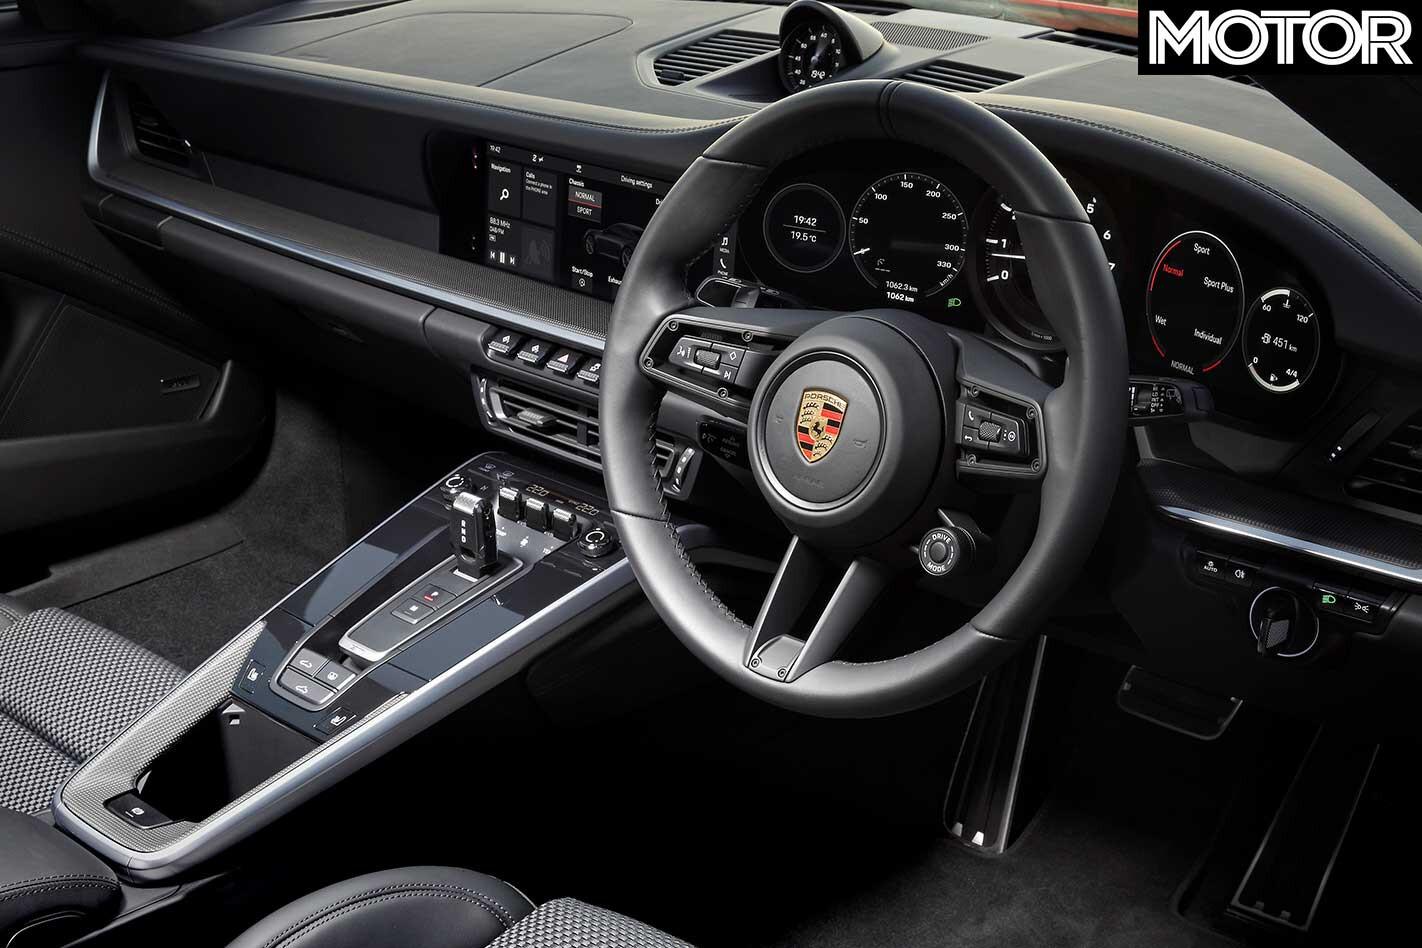 2019 Porsche 911 Carrera S Dashboard Jpg